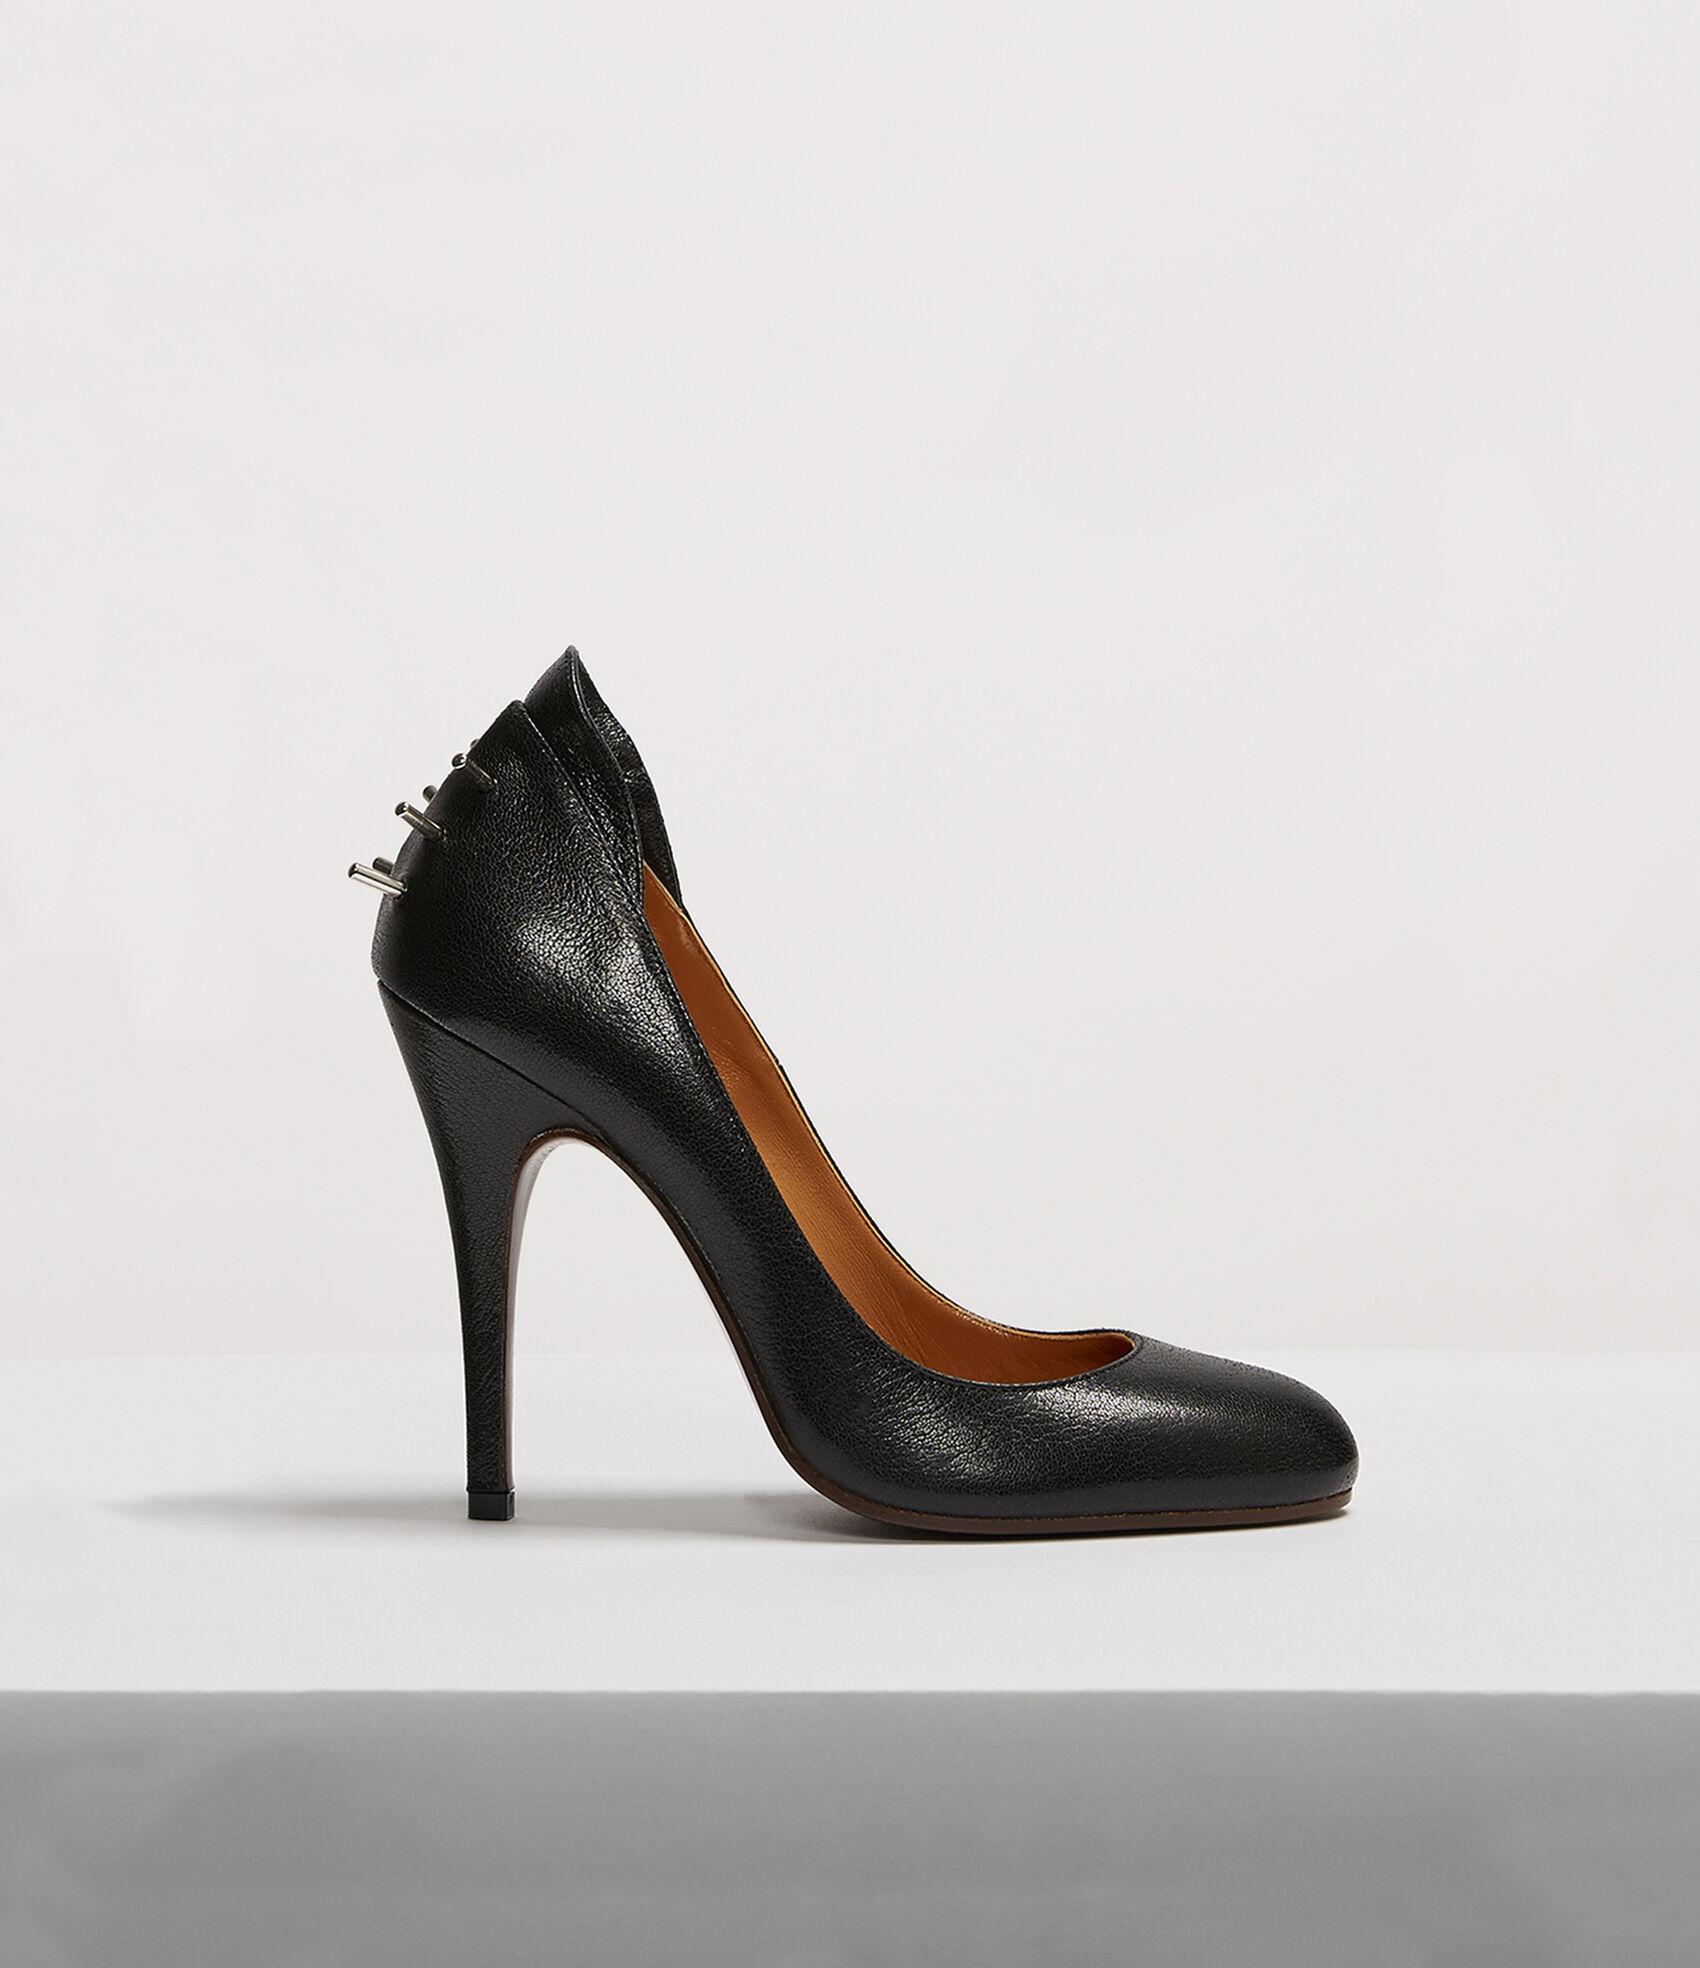 0f5f241fba2 Vivienne Westwood Women s Designer Pumps Women